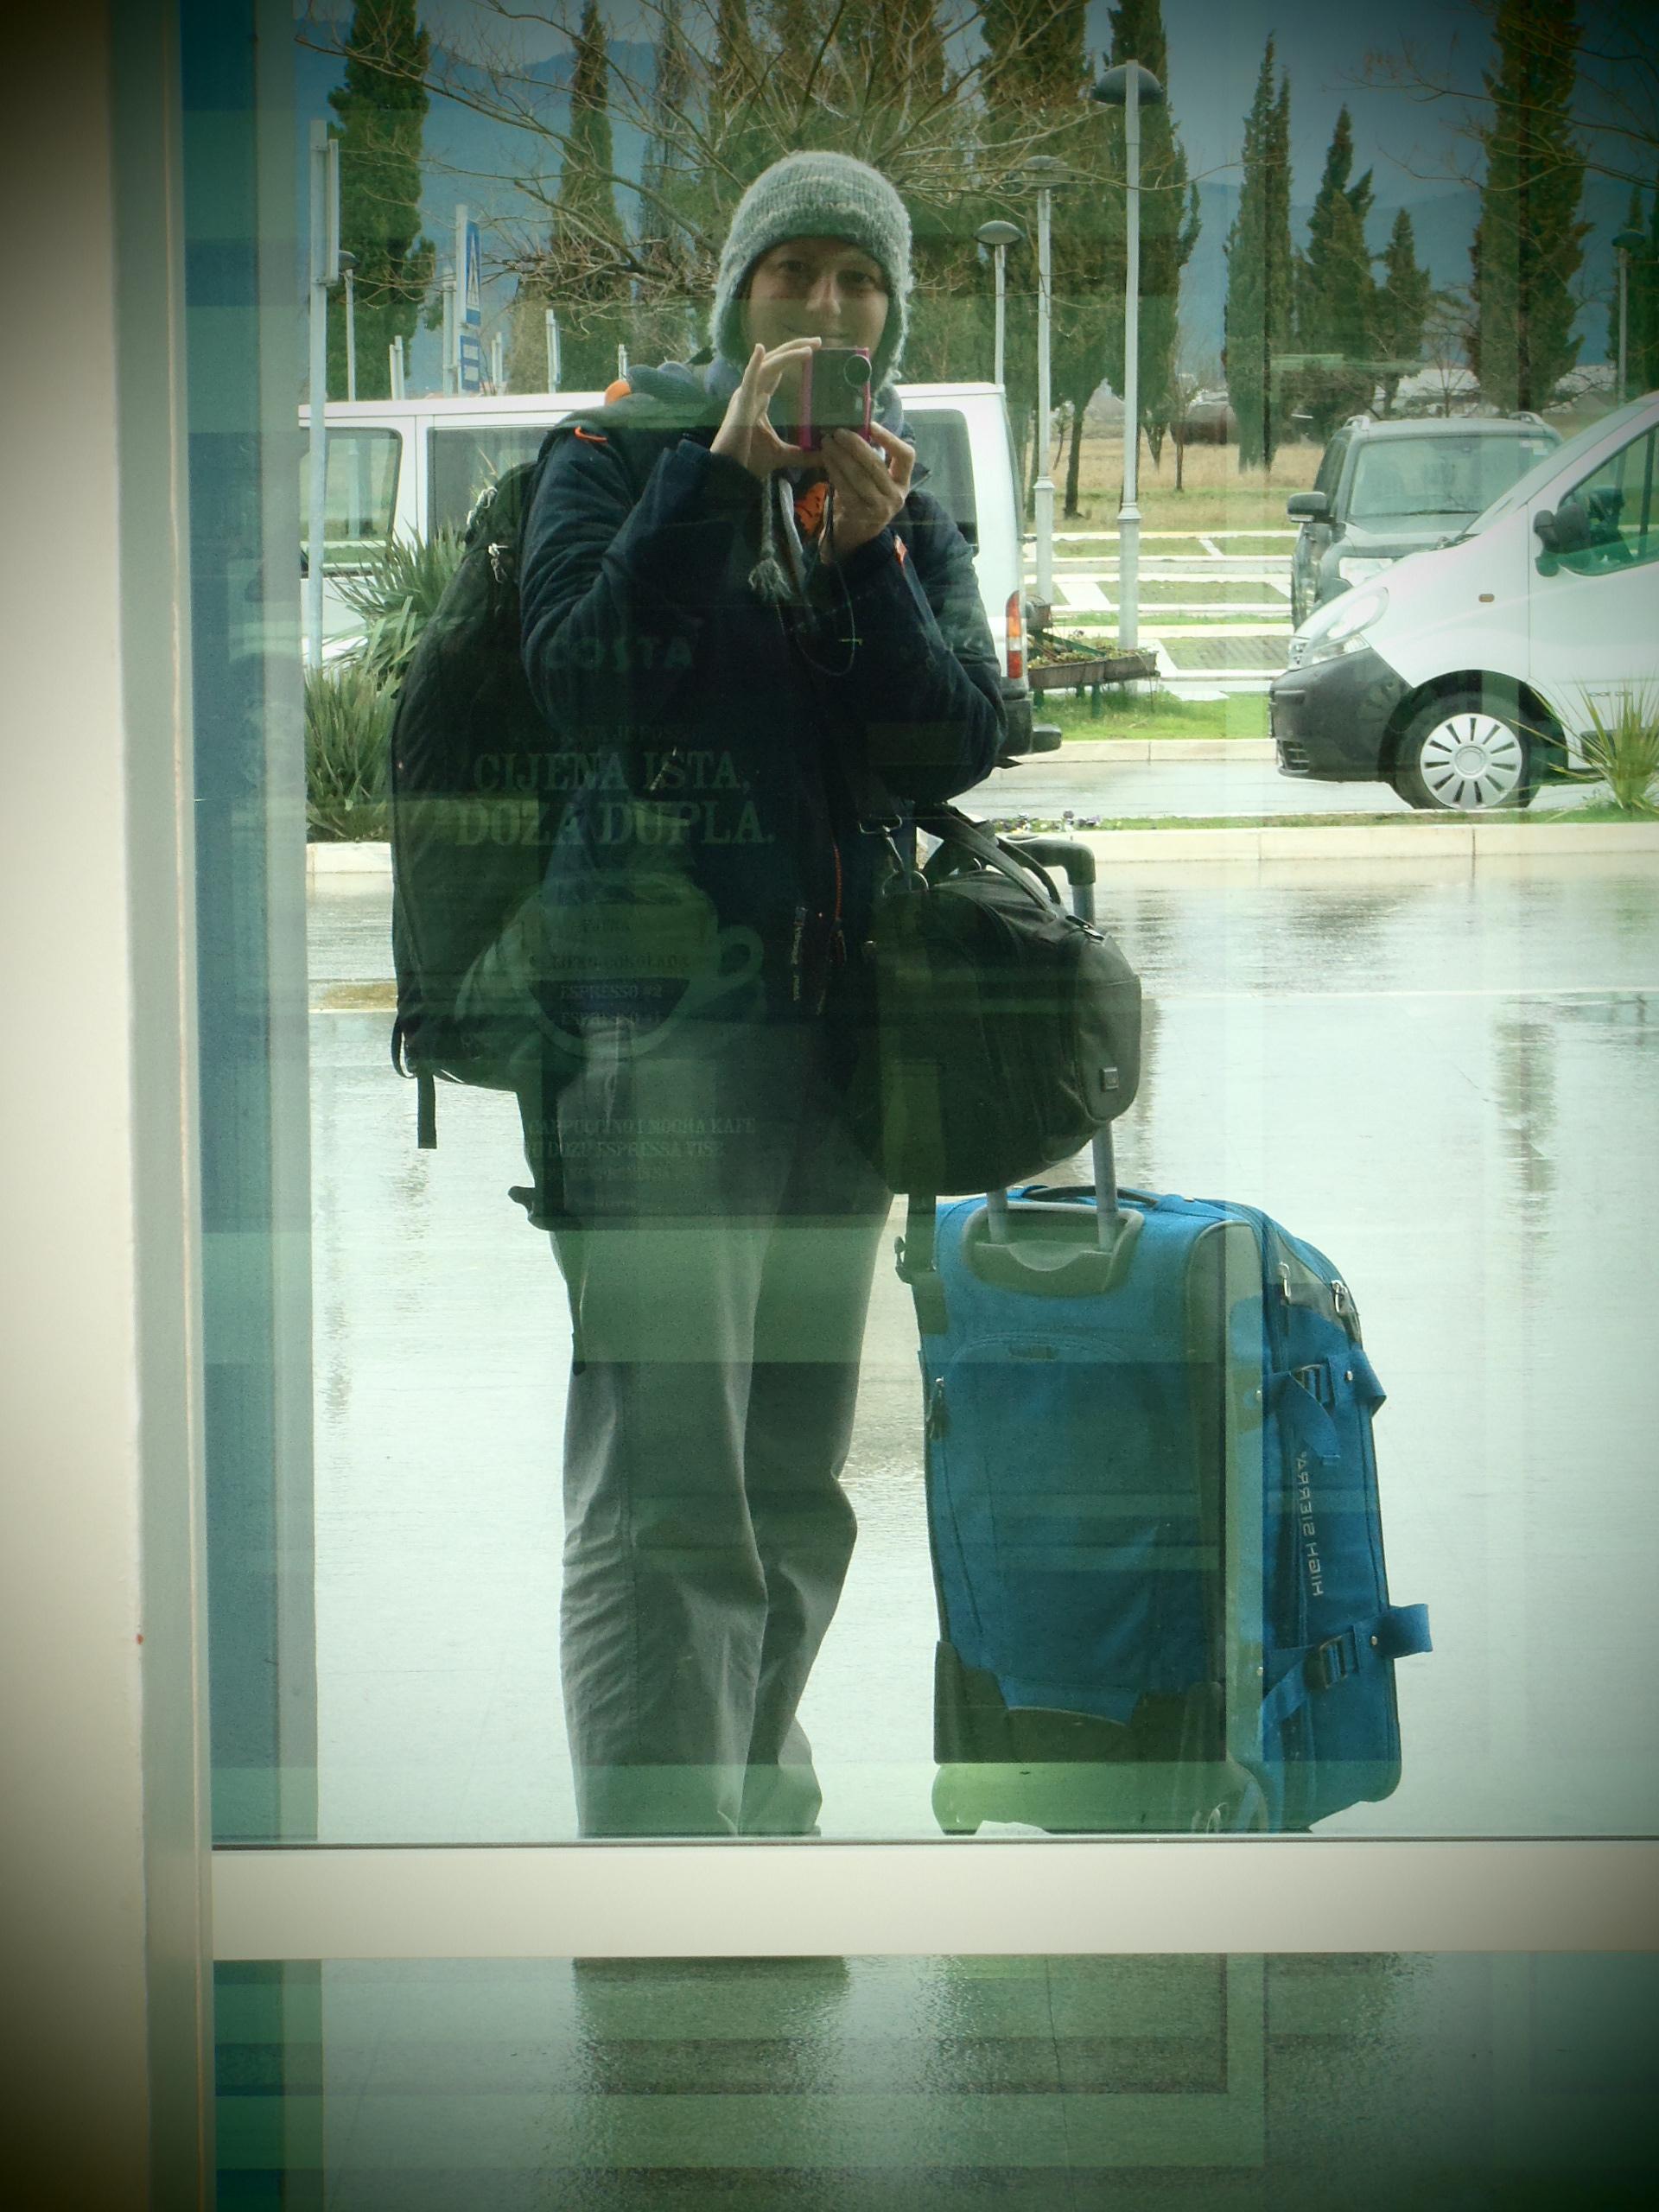 Selfie Creativity; Podgorica, Montenegro; 2013